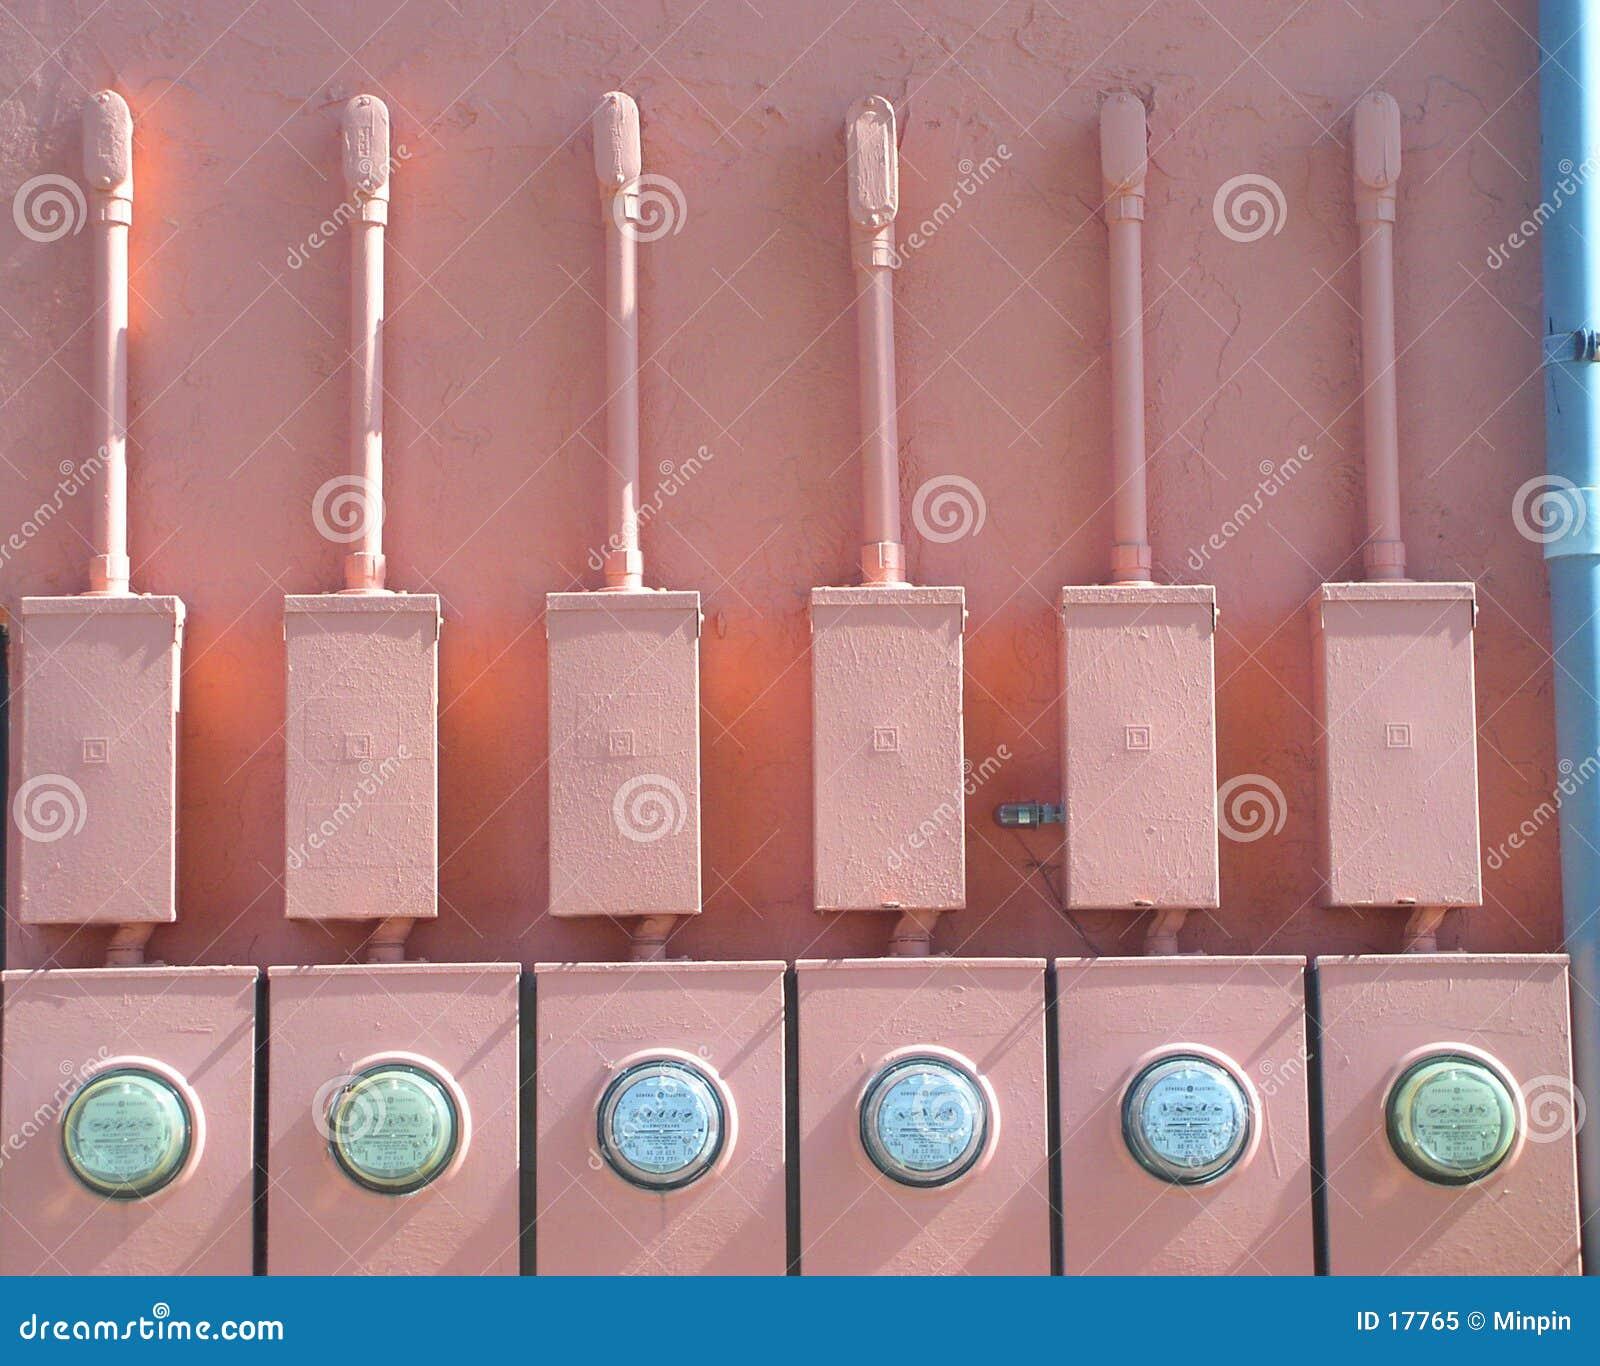 Contadores eléctricos chistosos